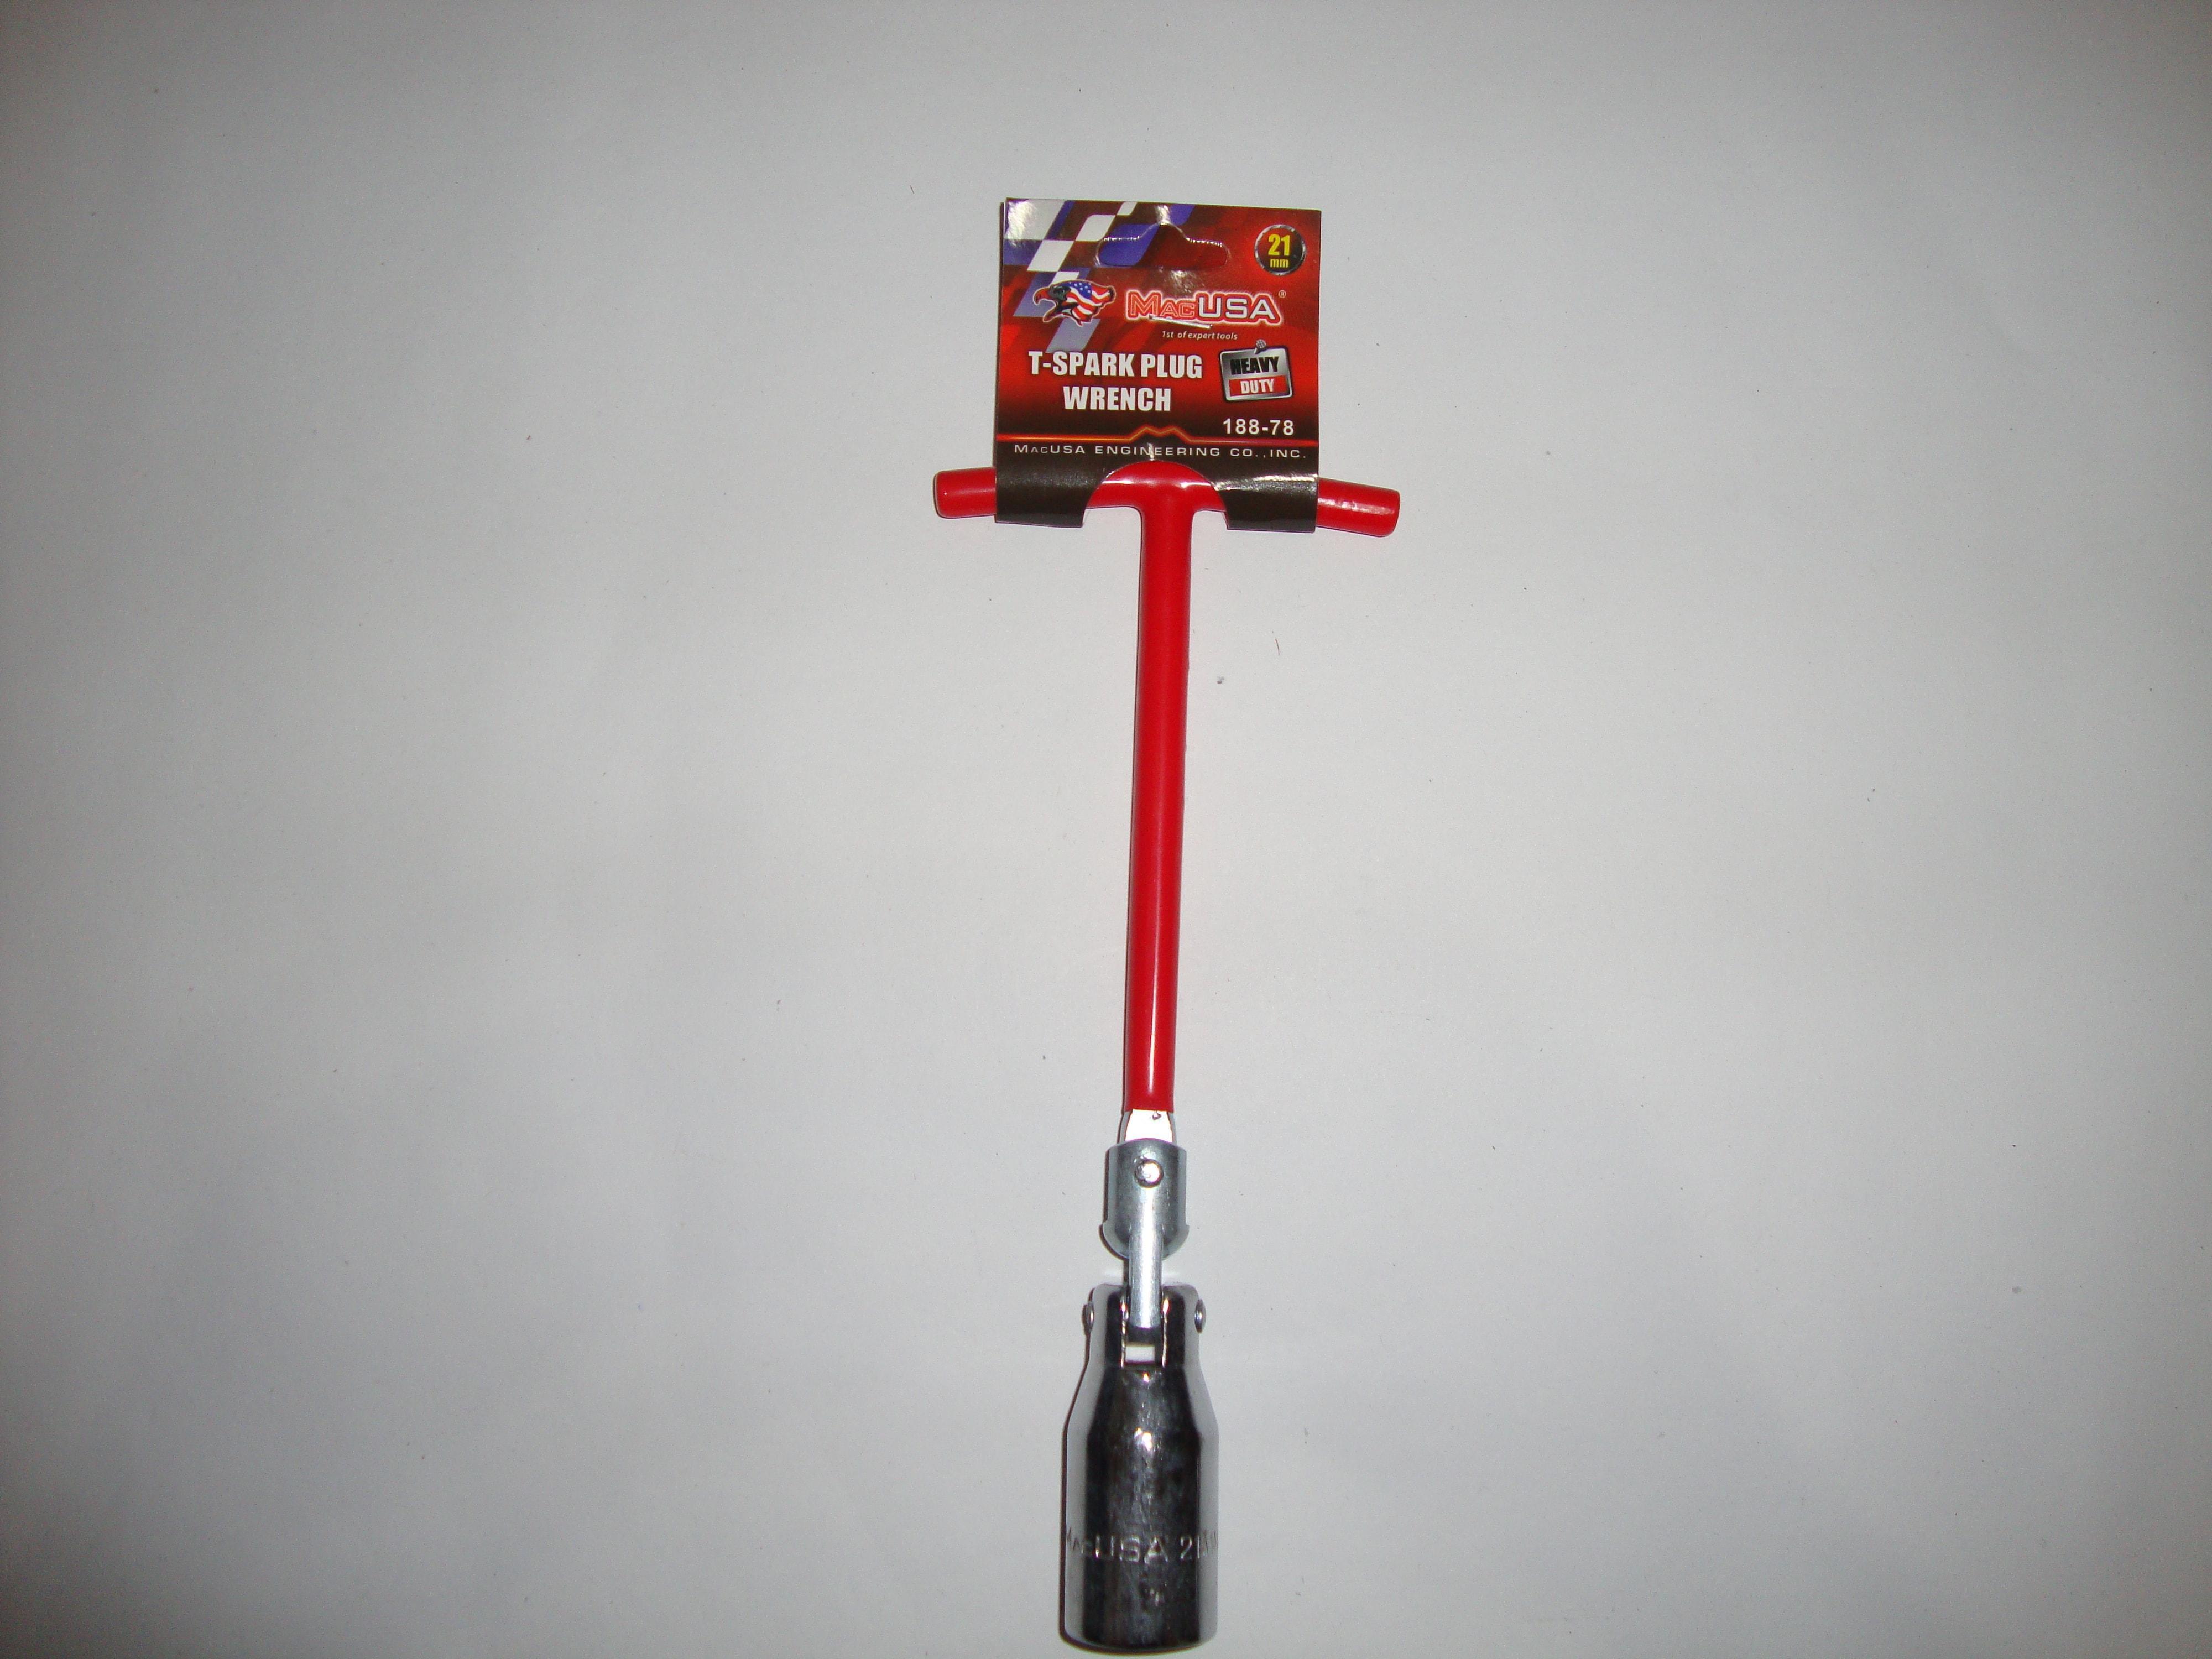 Kunci Busi Flexibel 21mm / T-spark Plug Wrench Heavy Duty